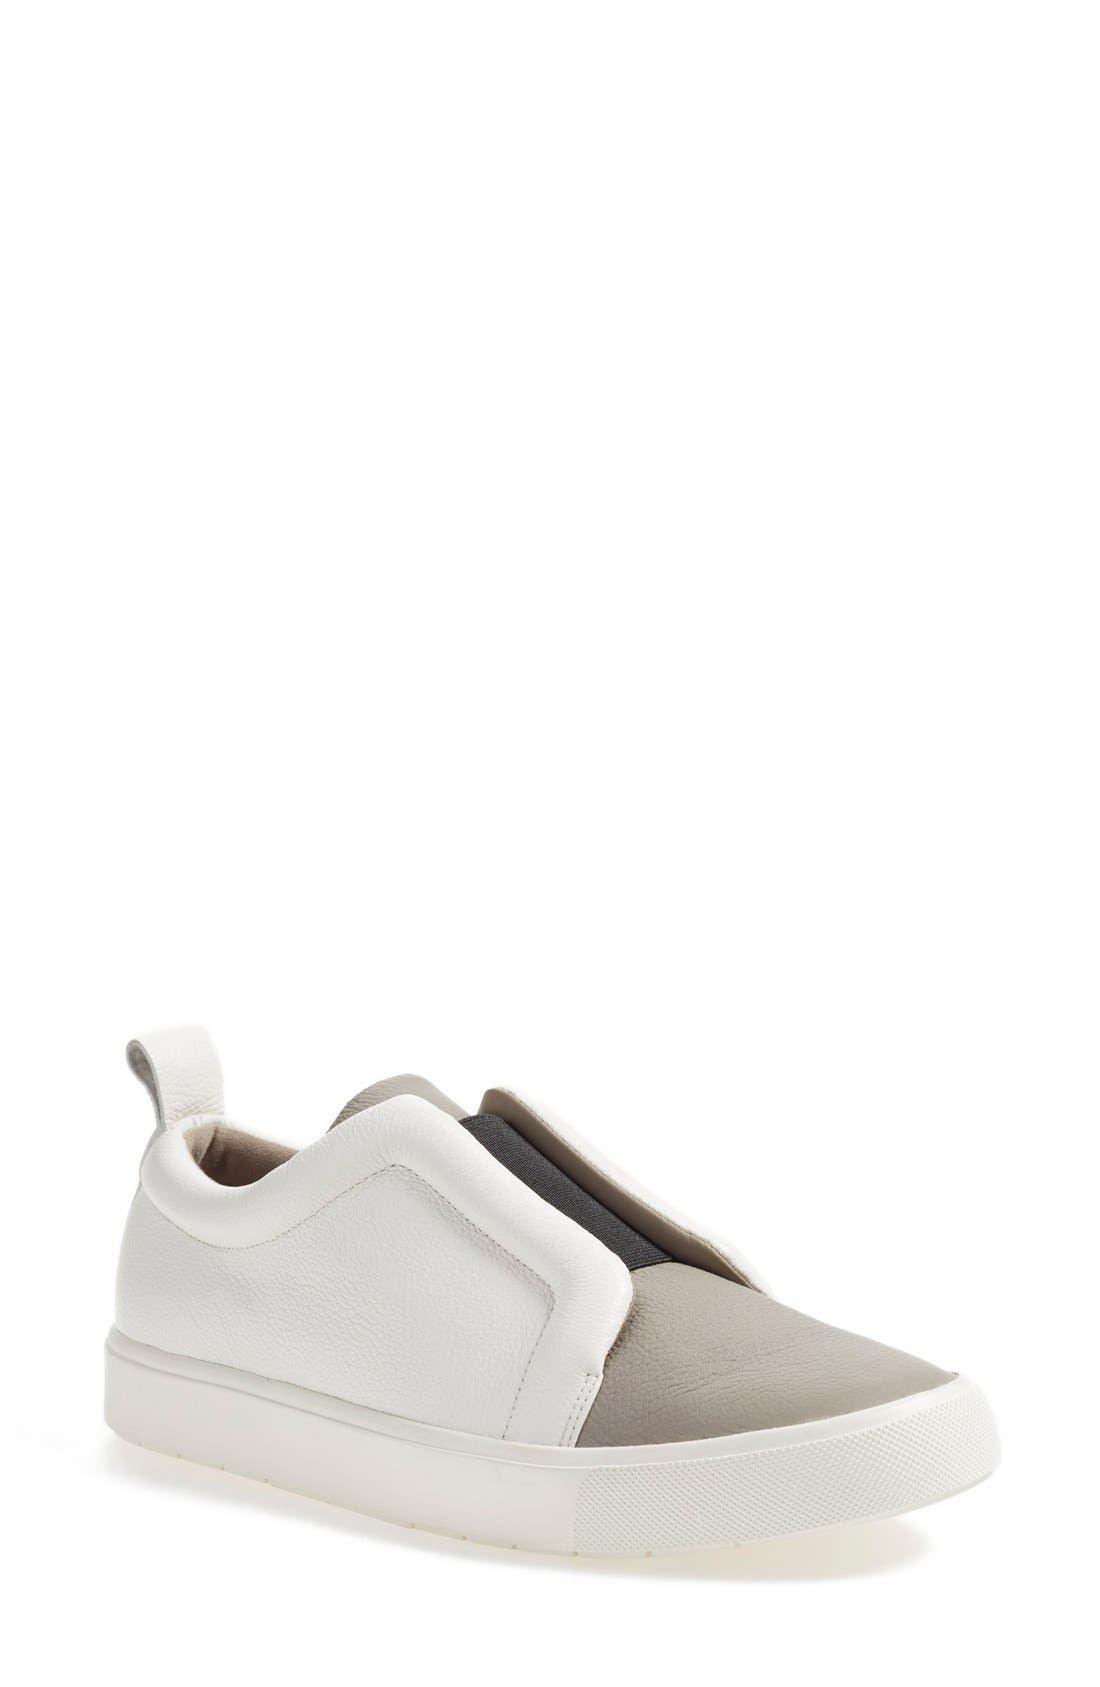 'Caden' Slip-On Sneaker,                         Main,                         color, 029